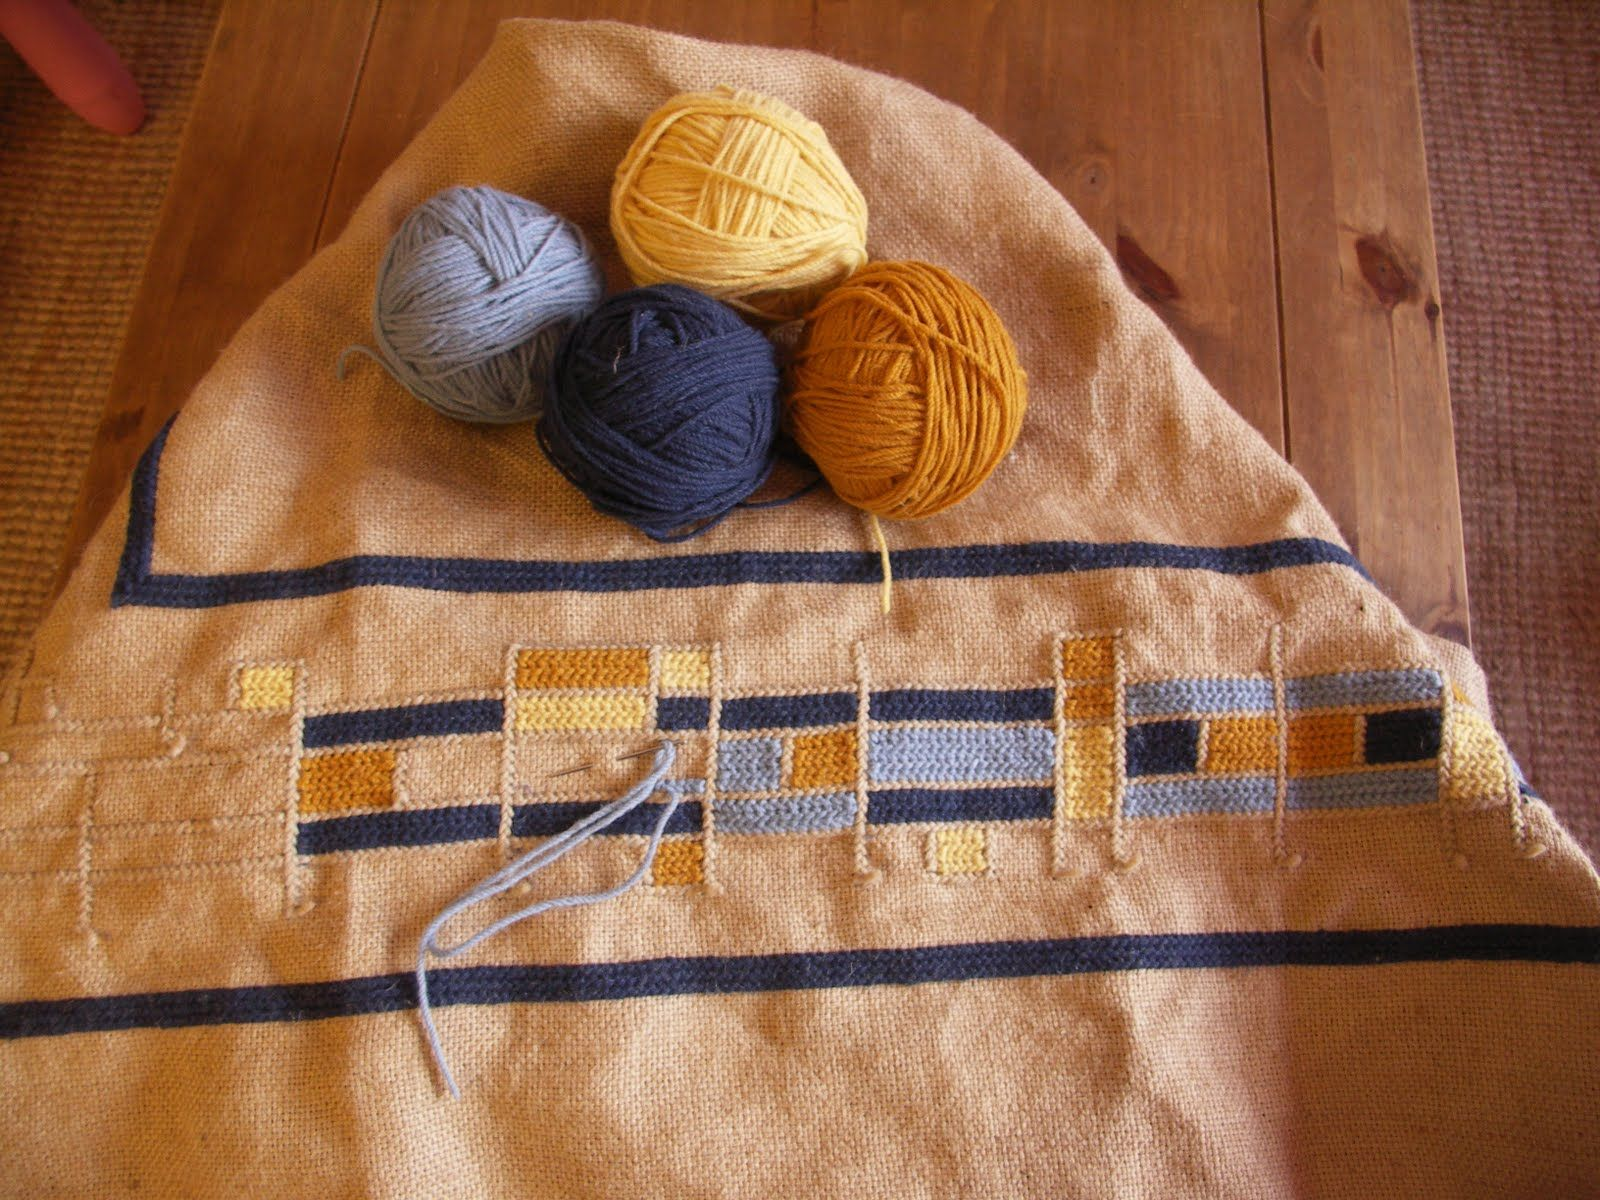 arraiolos portugal carpet embroidery